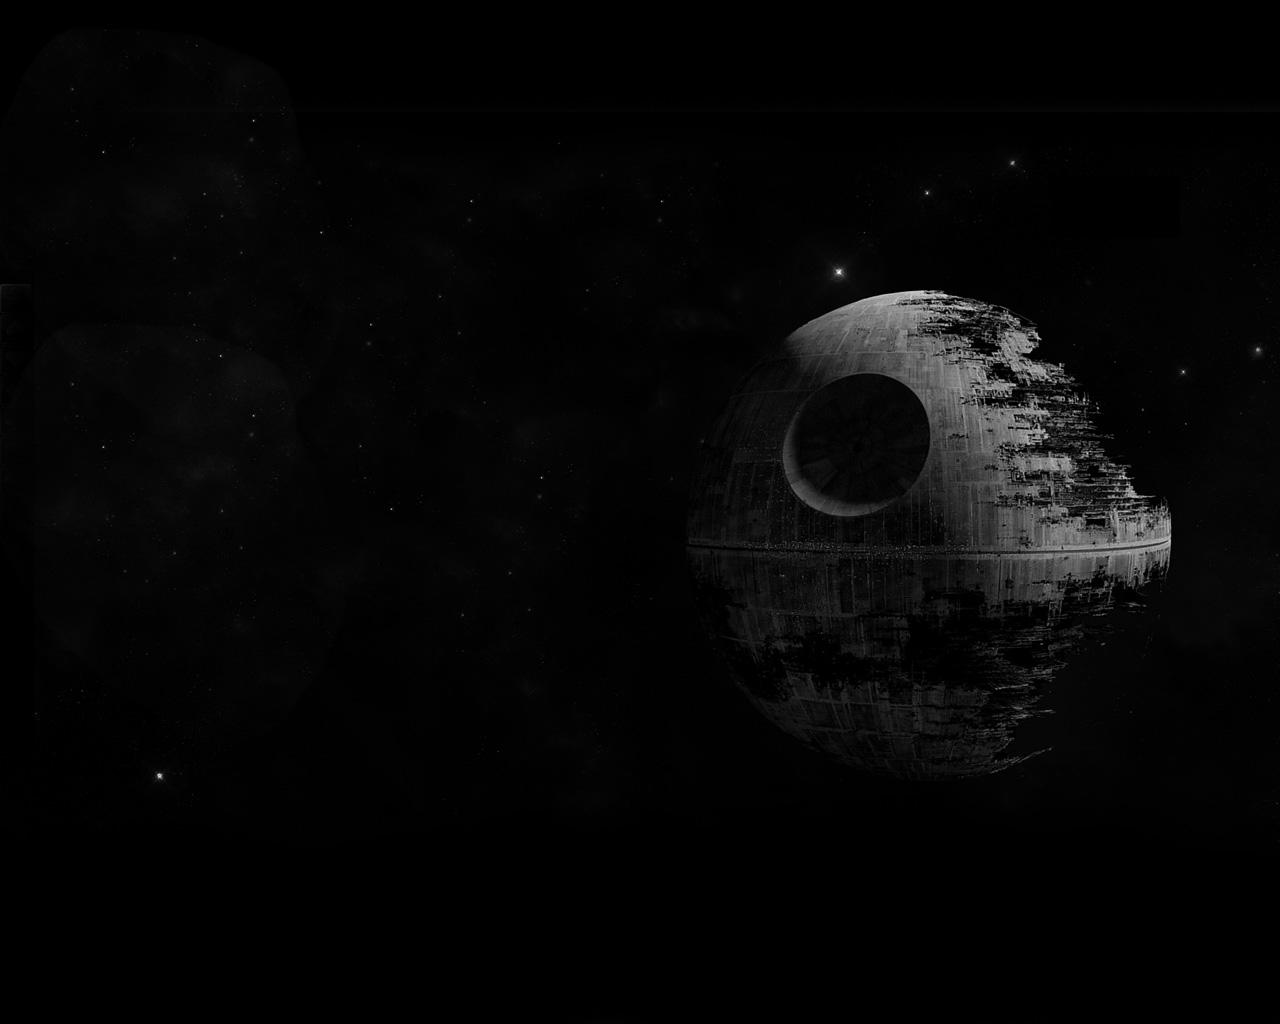 star wars desktop wallpaper hd - photo #40